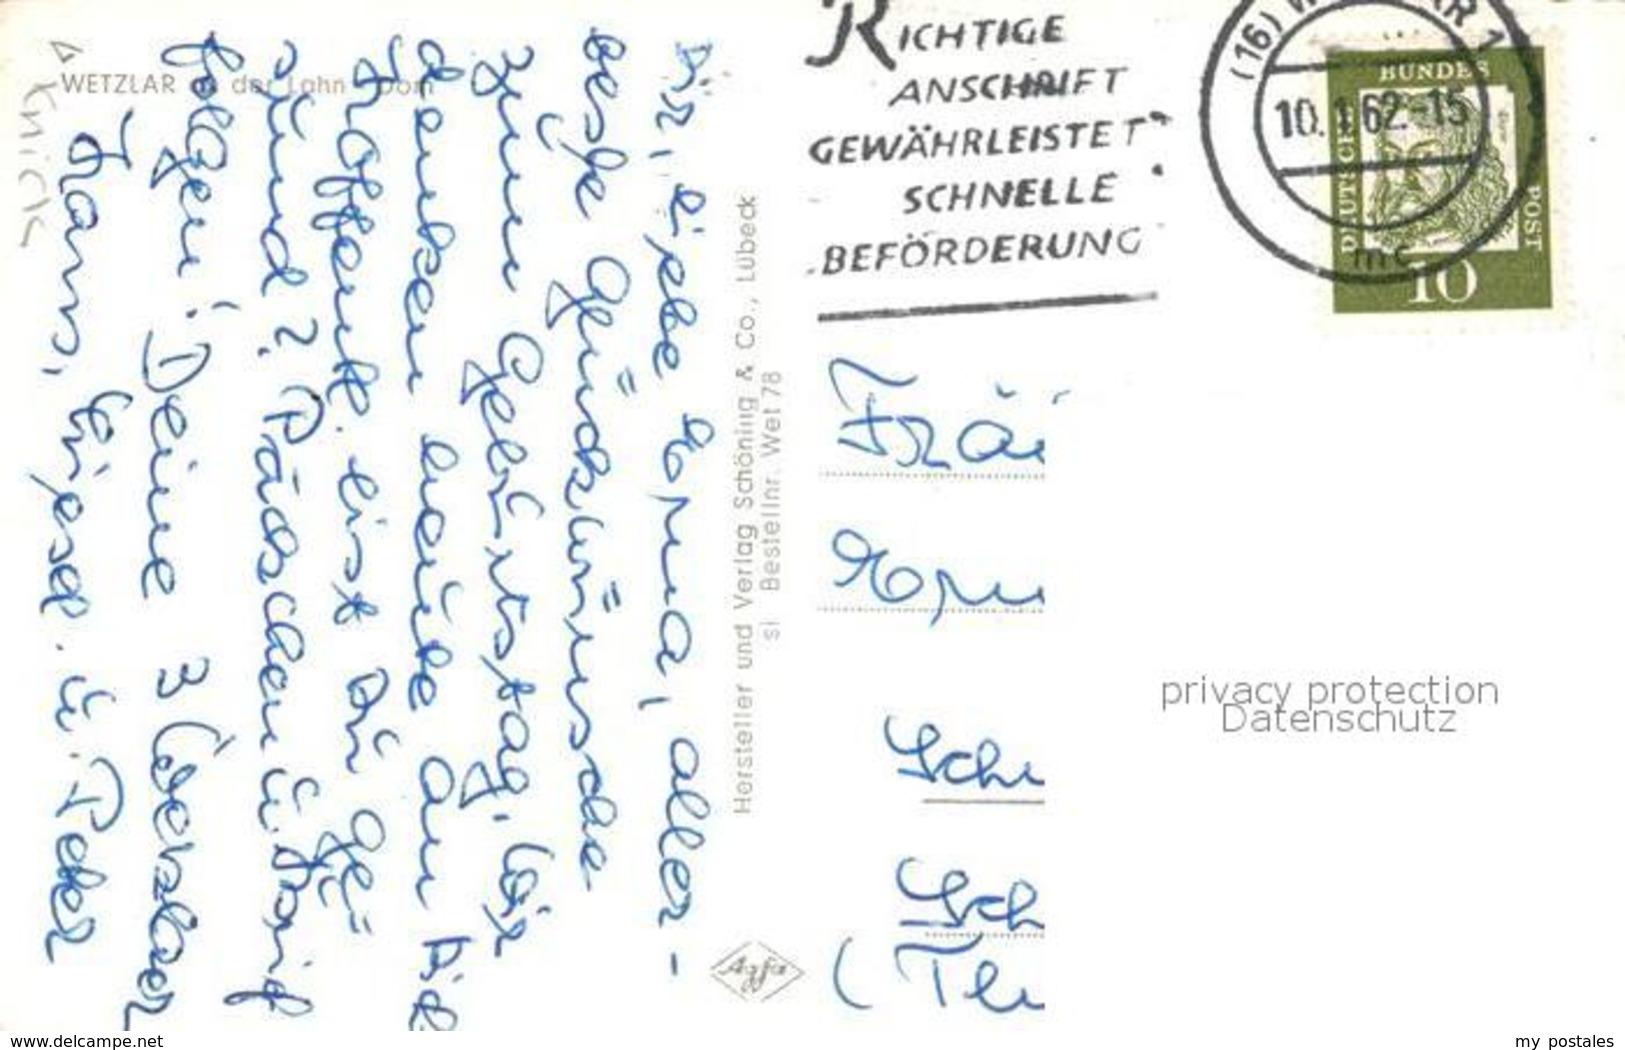 73335274 Wetzlar Dom Brunnen Wetzlar - Wetzlar